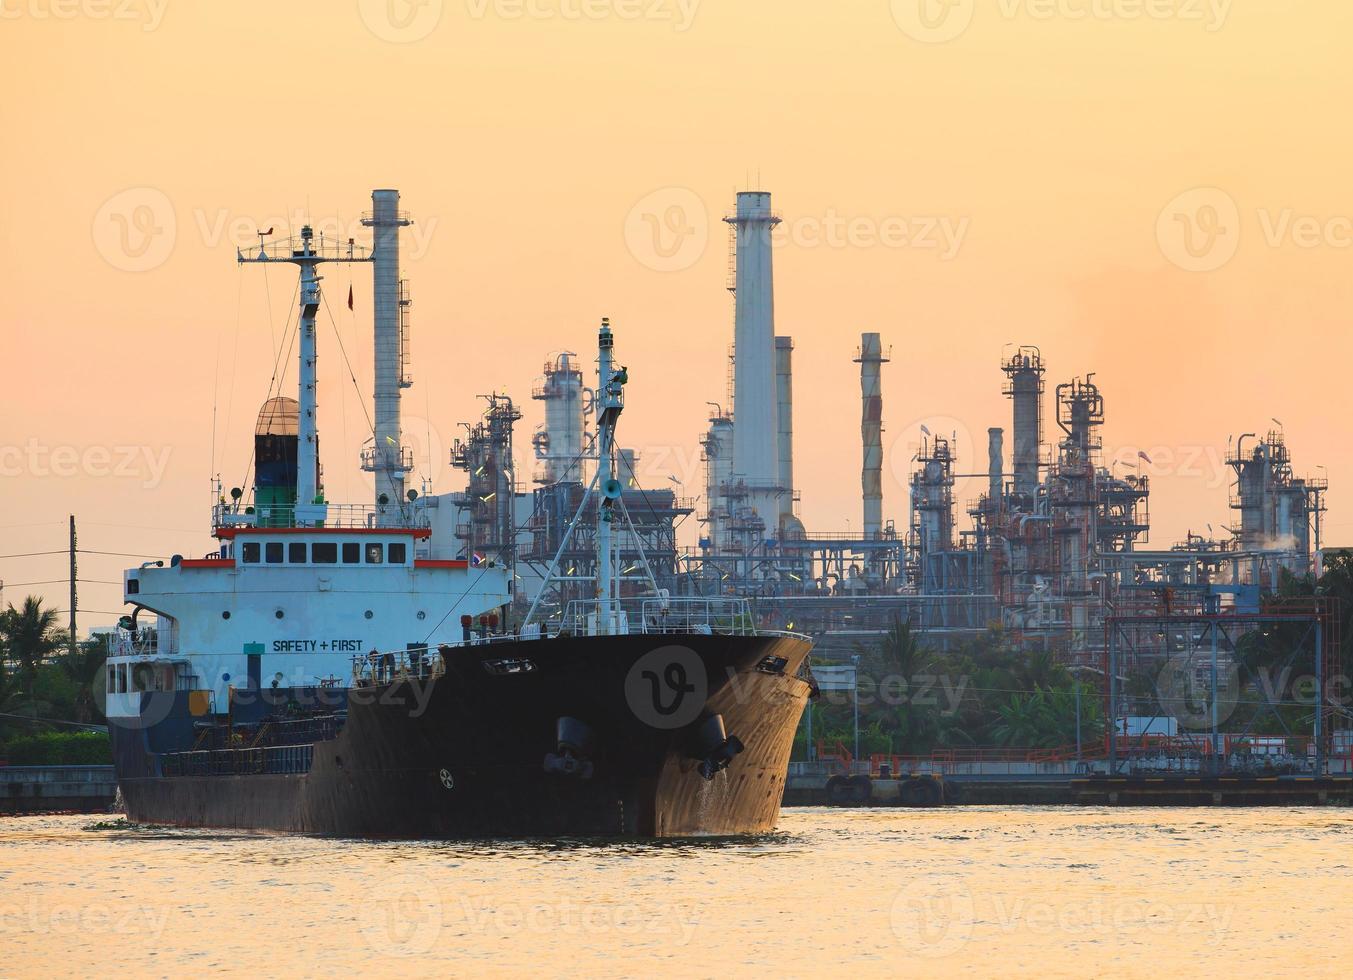 navio petroquímico de contêineres na frente da refinaria de petróleo foto